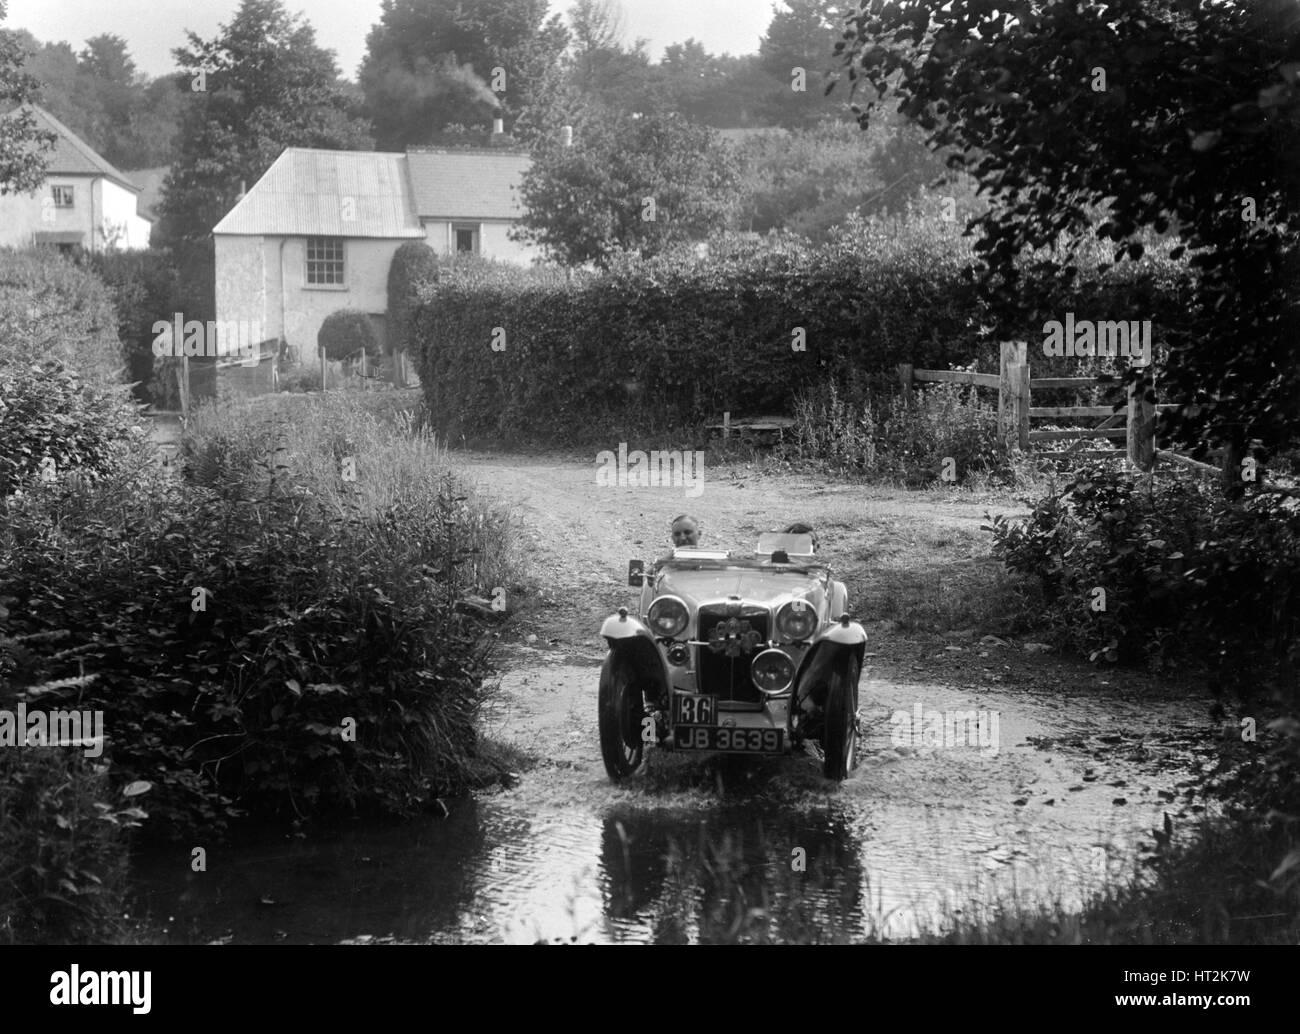 MG PA of RA MacDermid, B&HMC Brighton-Beer Trial, Windout Lane, near Dunsford, Devon, 1934. Artist: Bill Brunell. - Stock Image